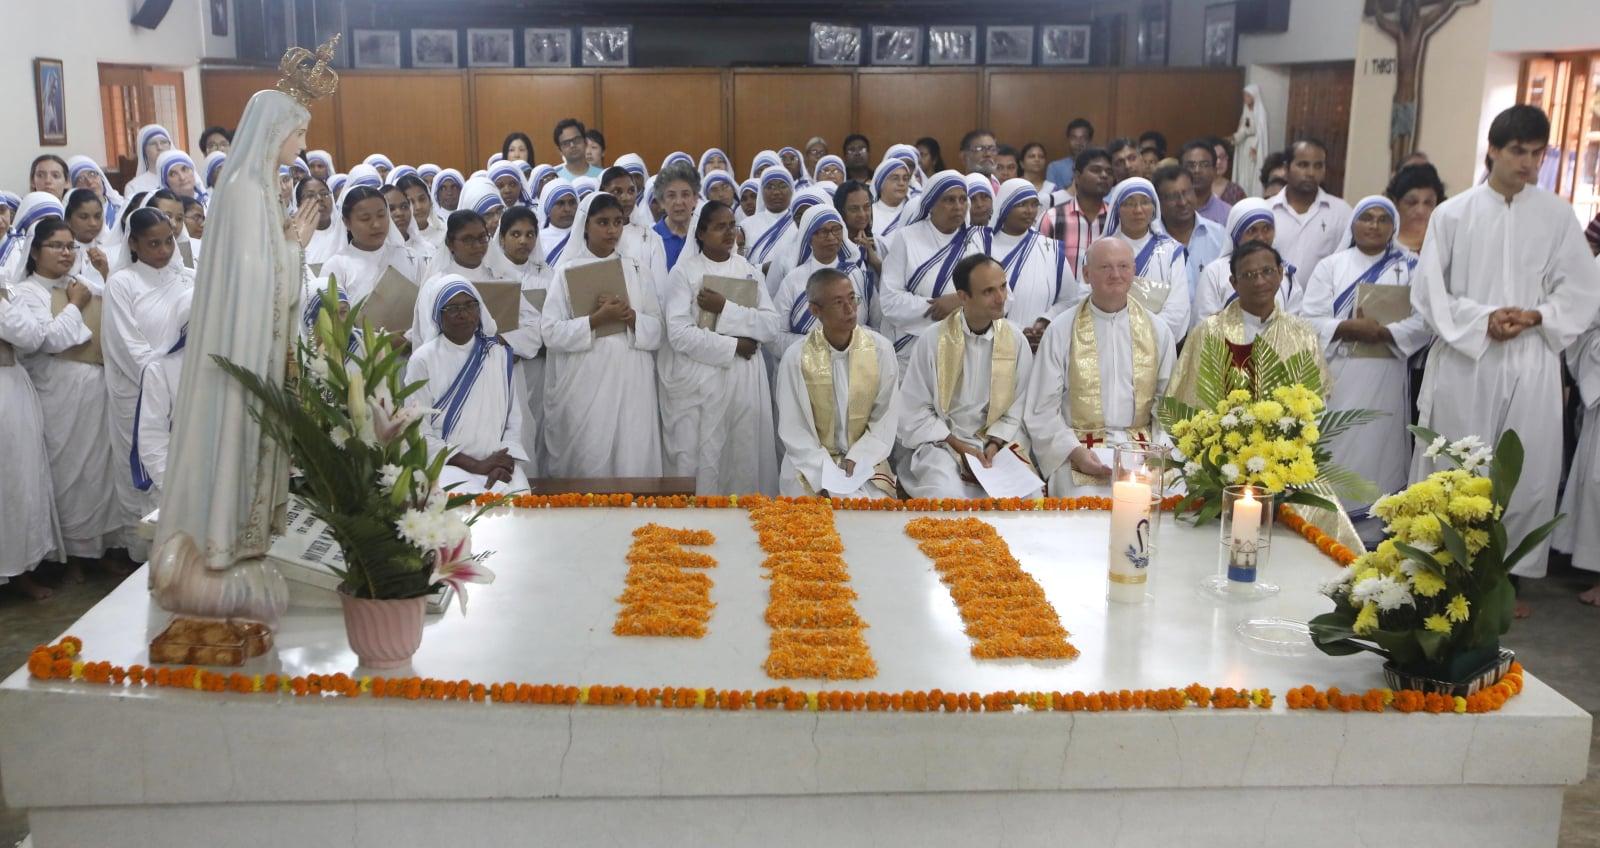 108. urodziny Matki Teresy z Kalkuty EPA/STR